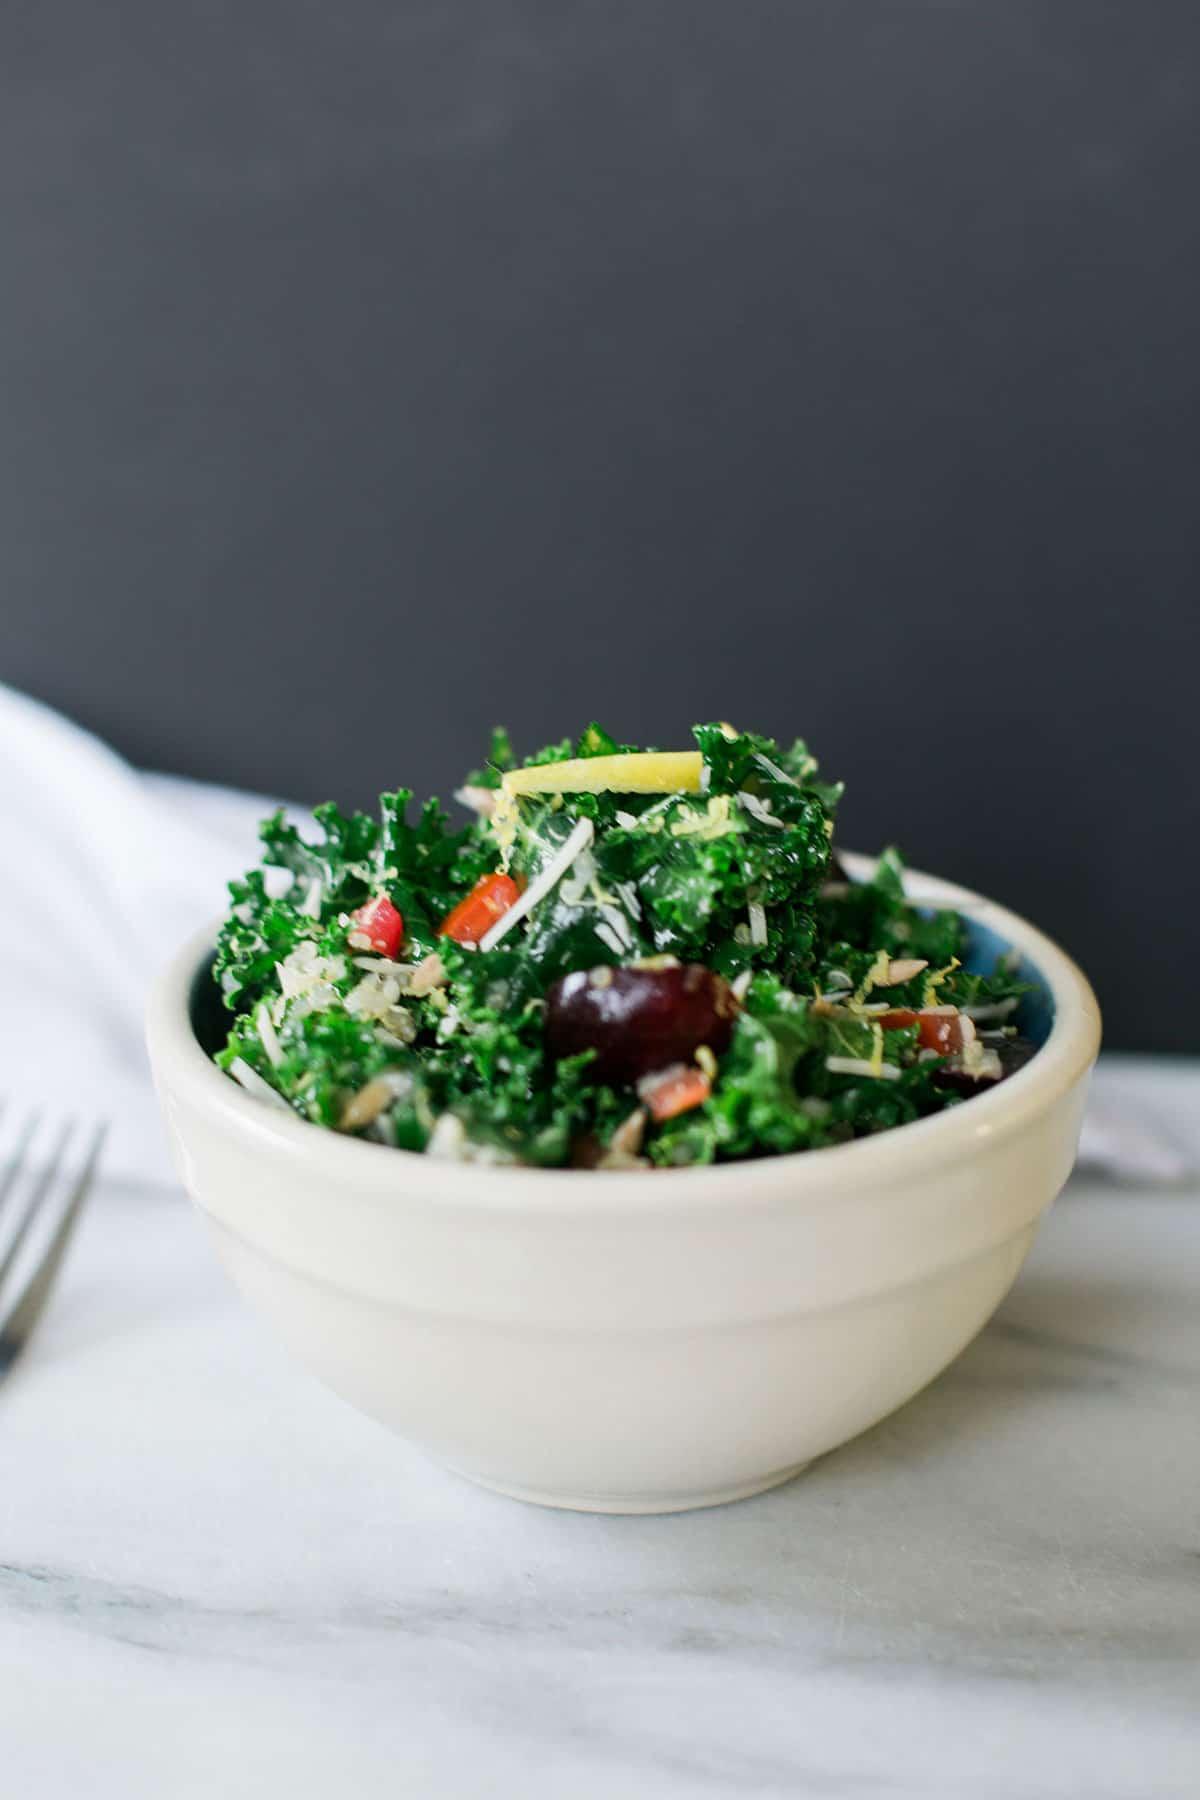 Chelsea S Kitchen Kale Salad Recipe Hack Female Foodie